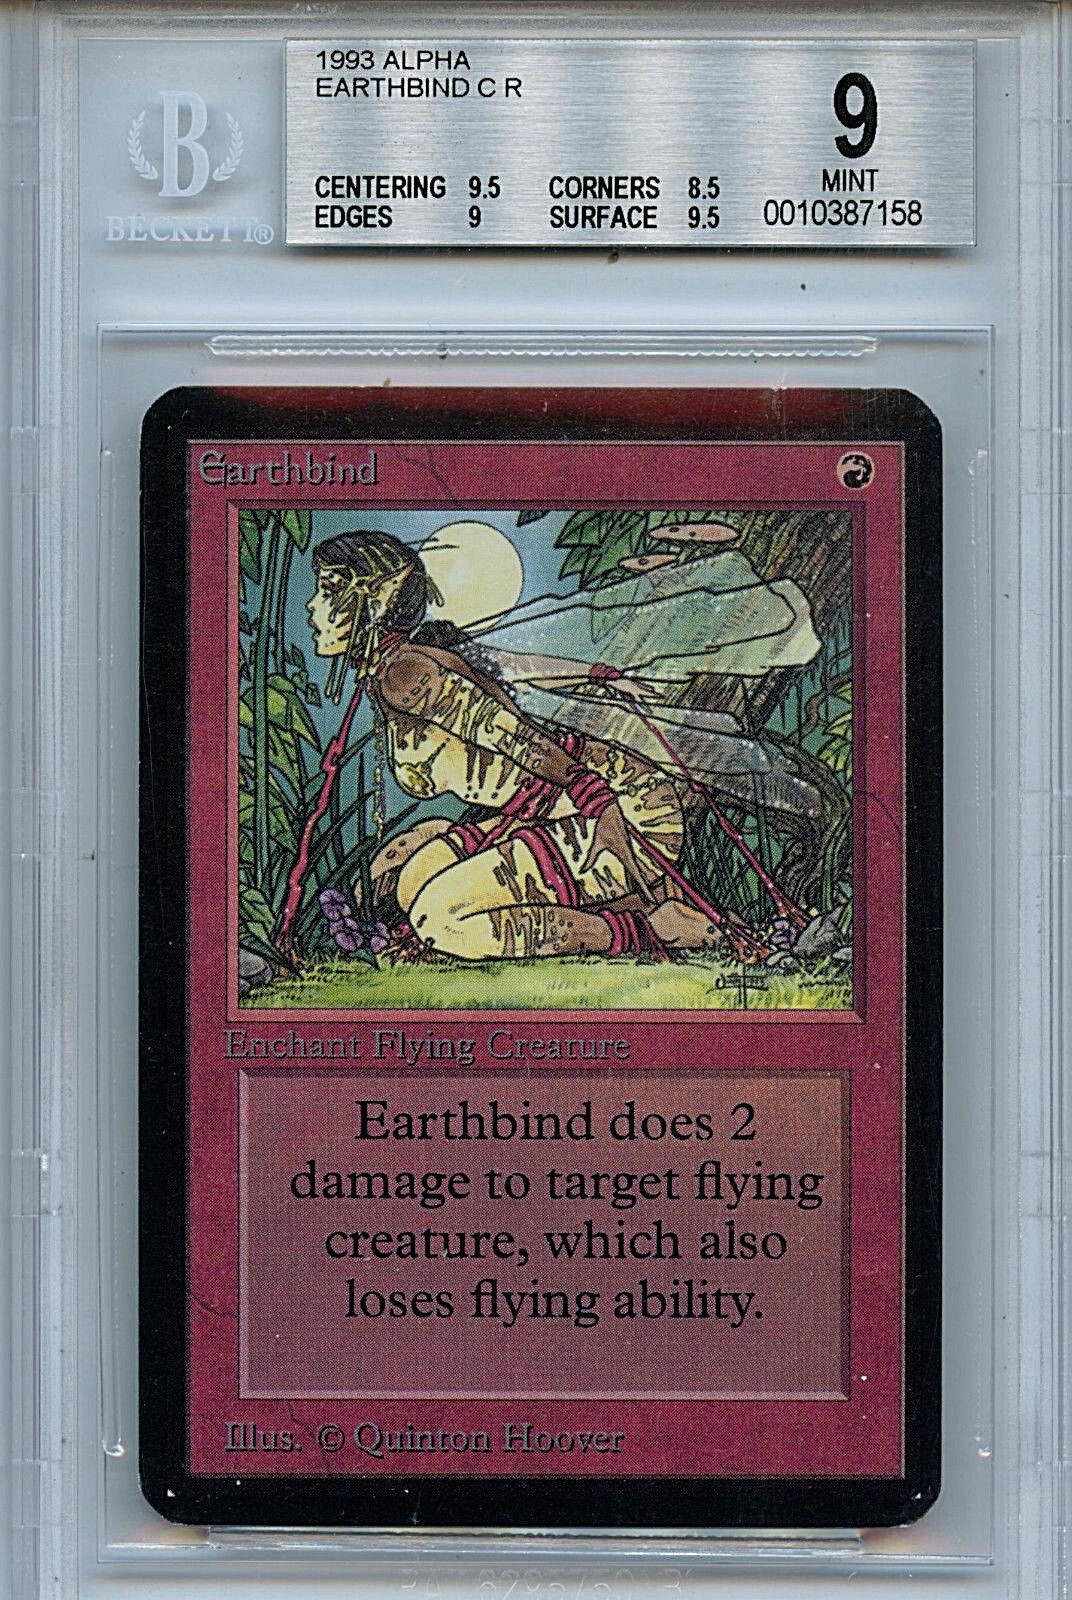 MTG Alpha Earthbind BGS 9.0 (9) Mint Card  Magic Magic Magic the Gathering Amricons 7158 e3d708